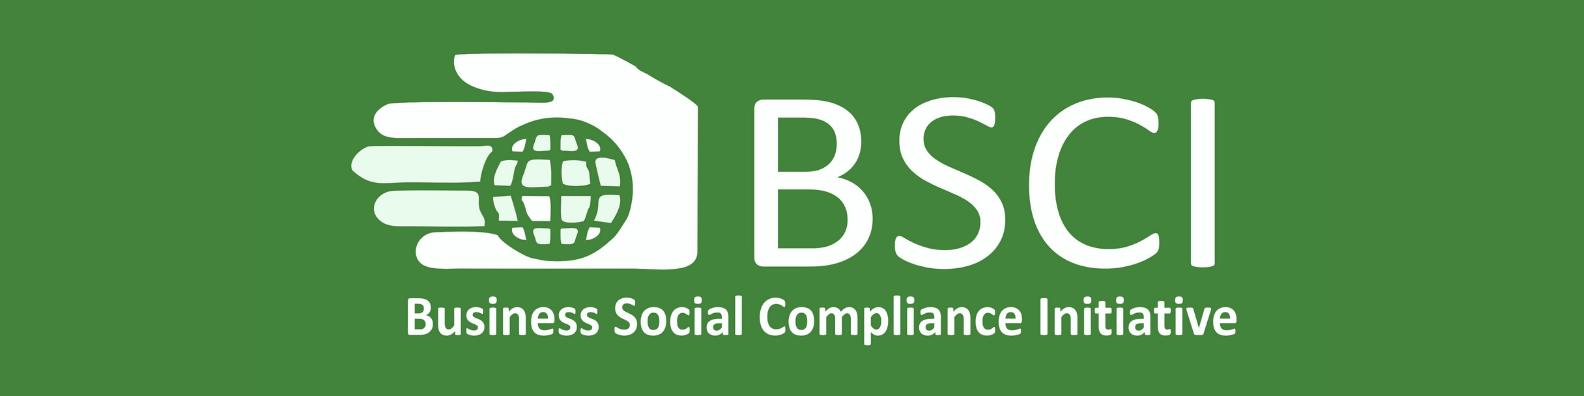 BSCI Certification amfori